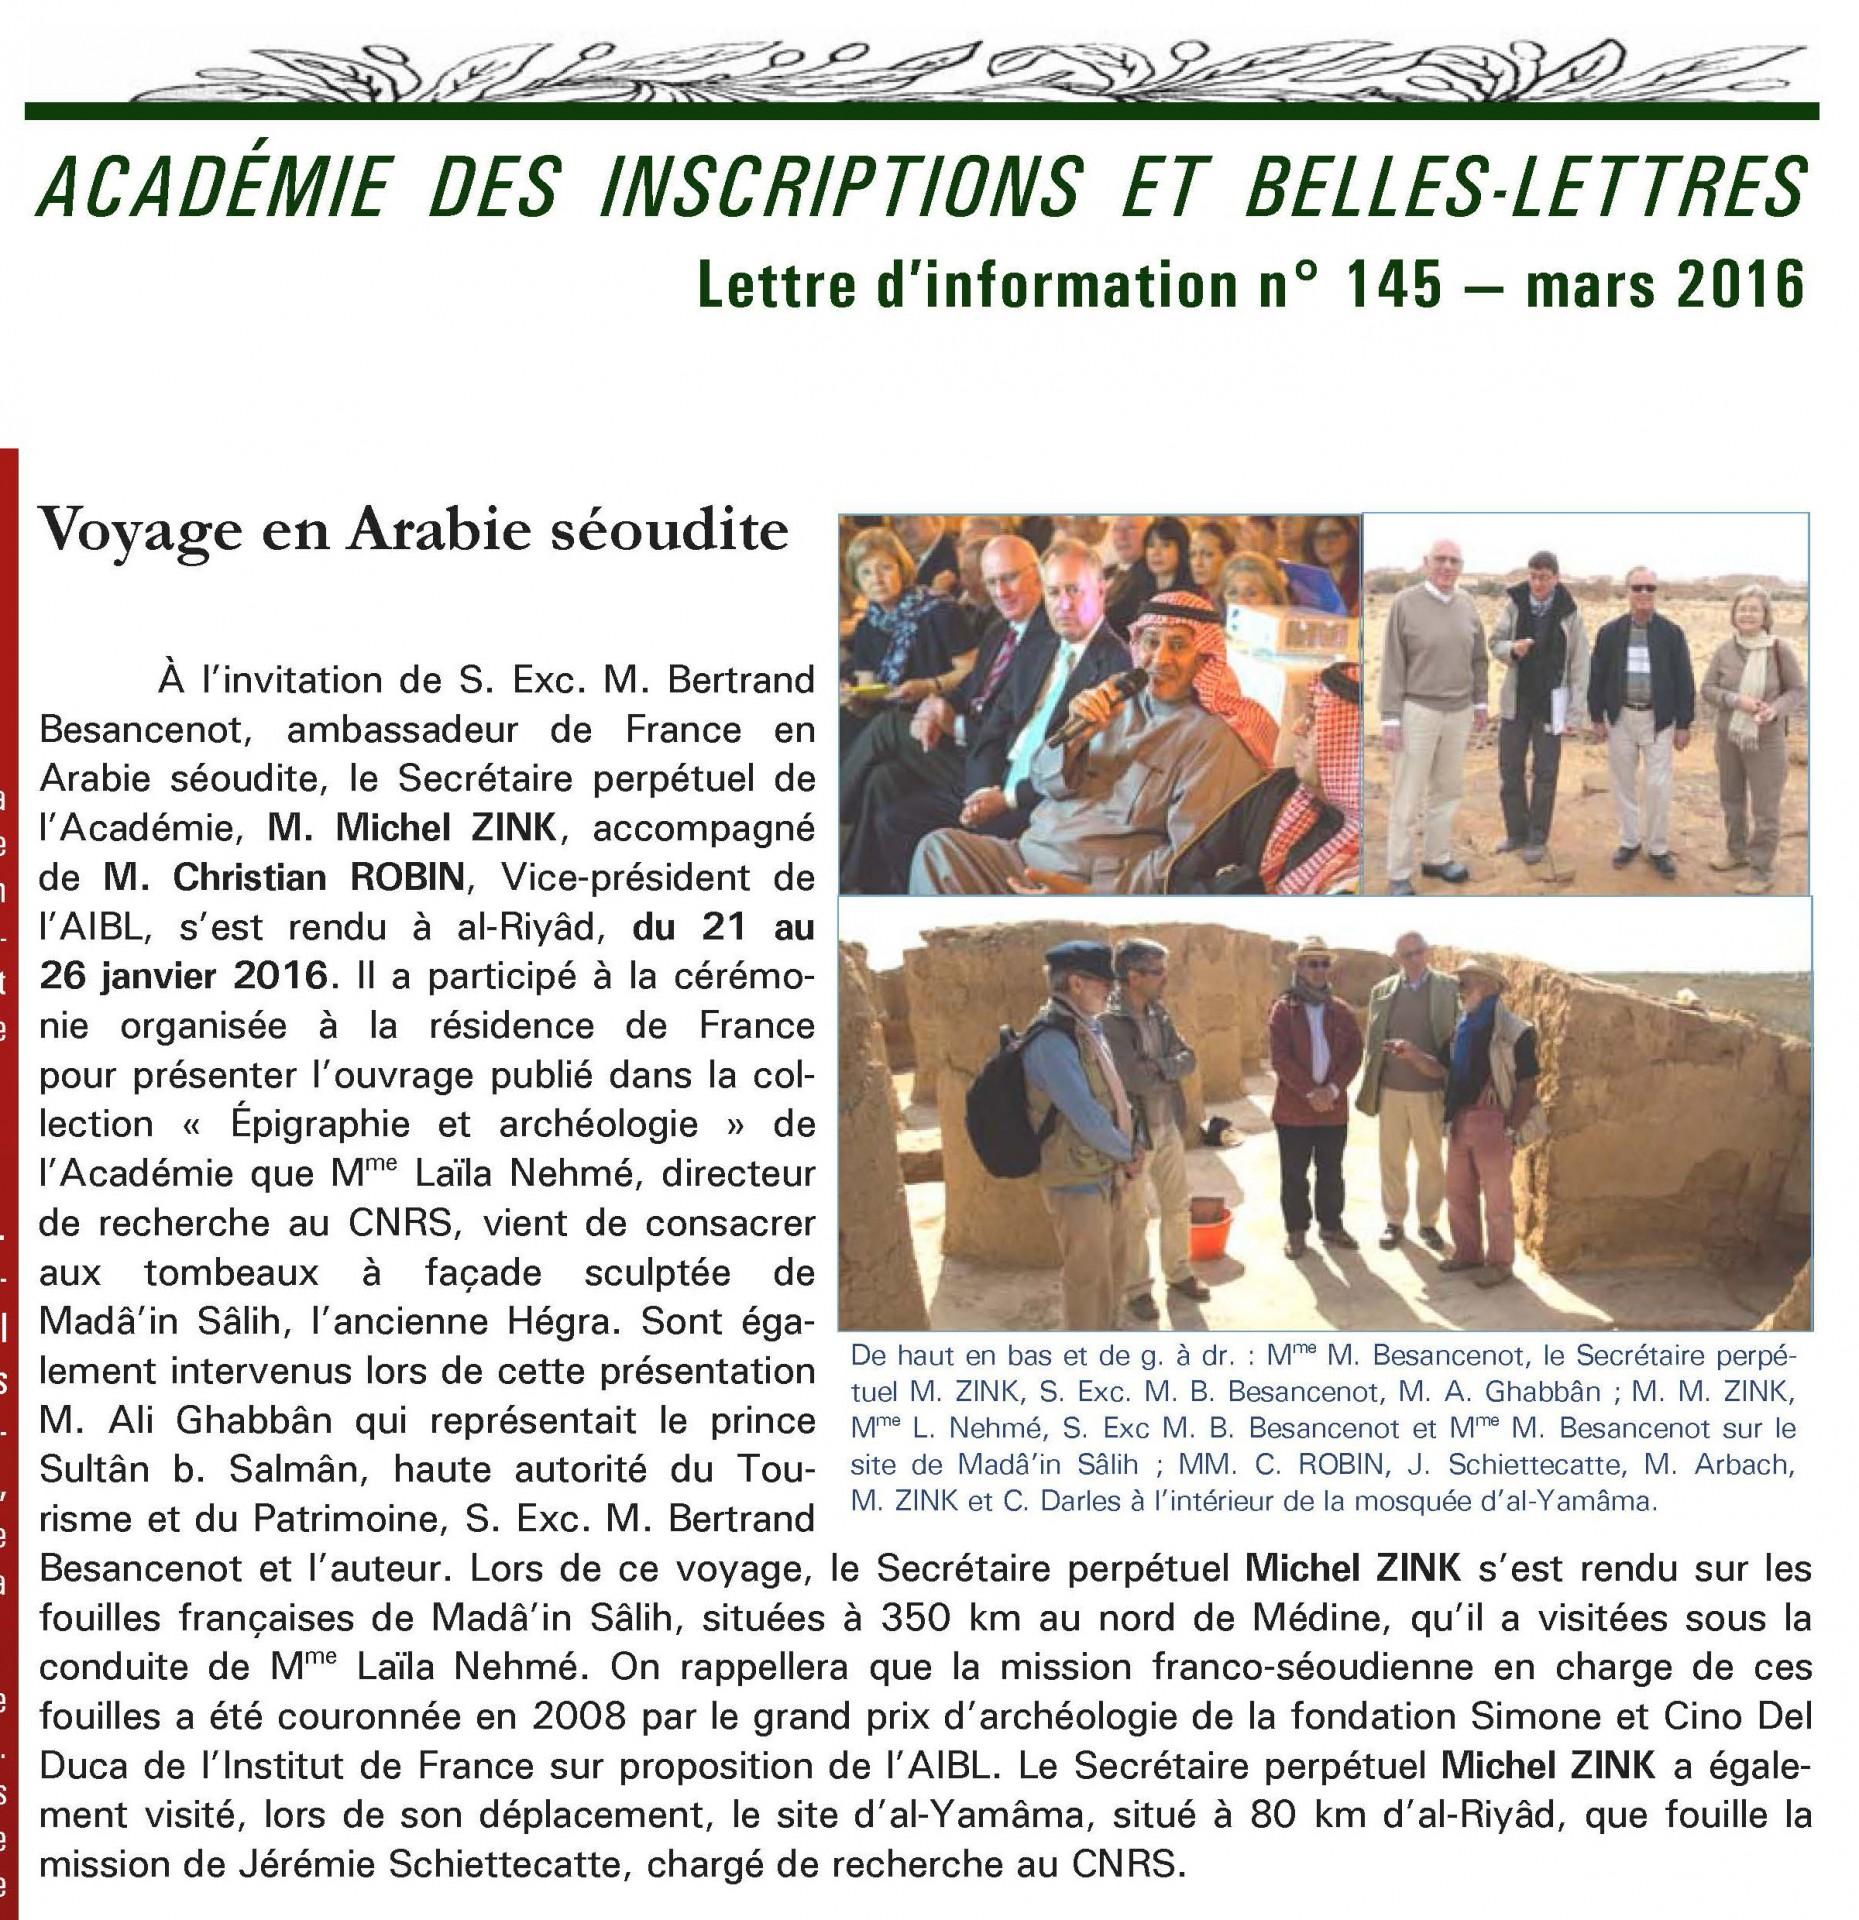 Voyage en Arabie Séoudite